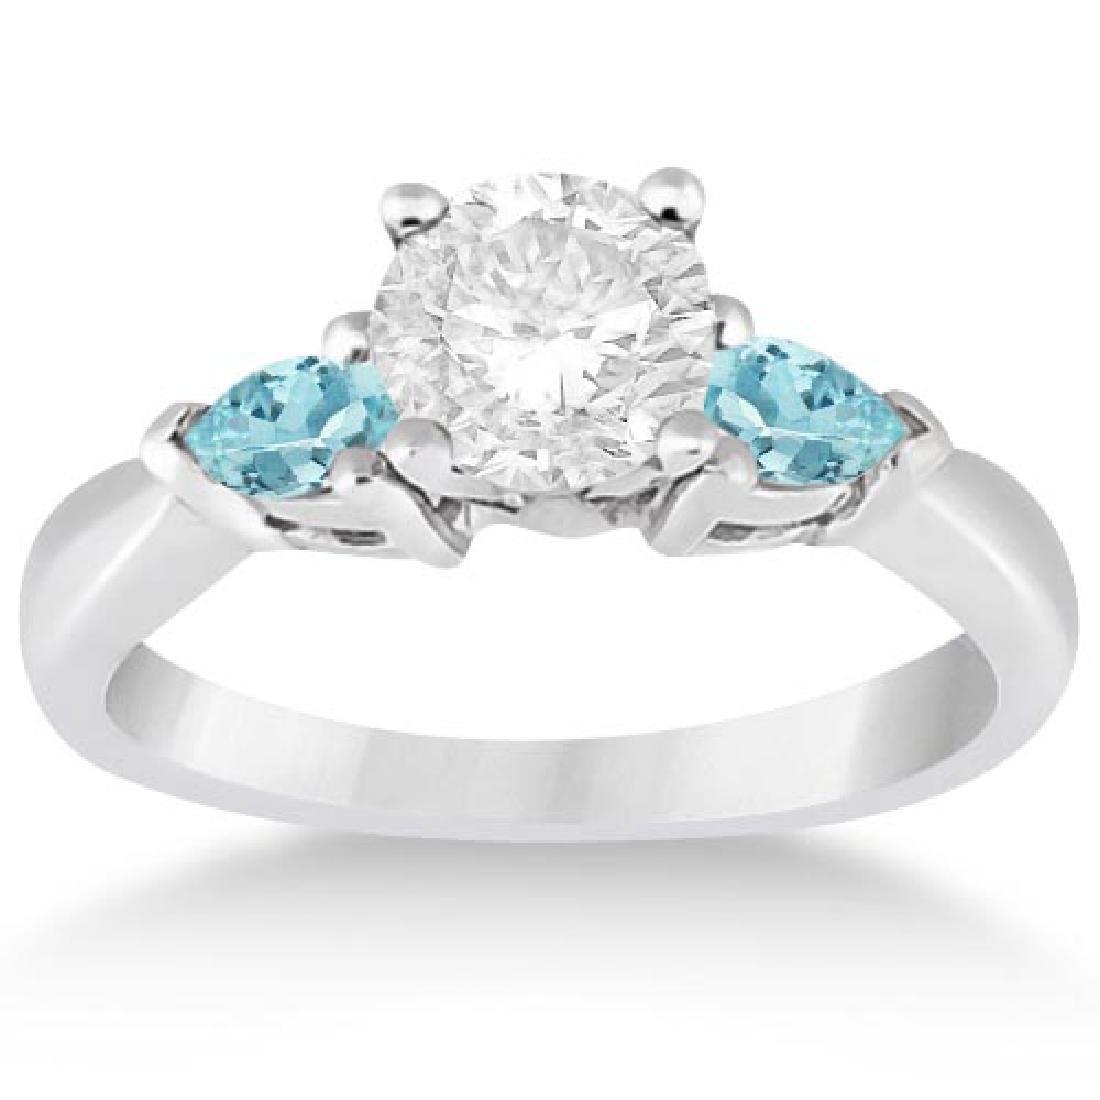 Pear Cut Three Stone Aquamarine Engagement Ring 14k Whi